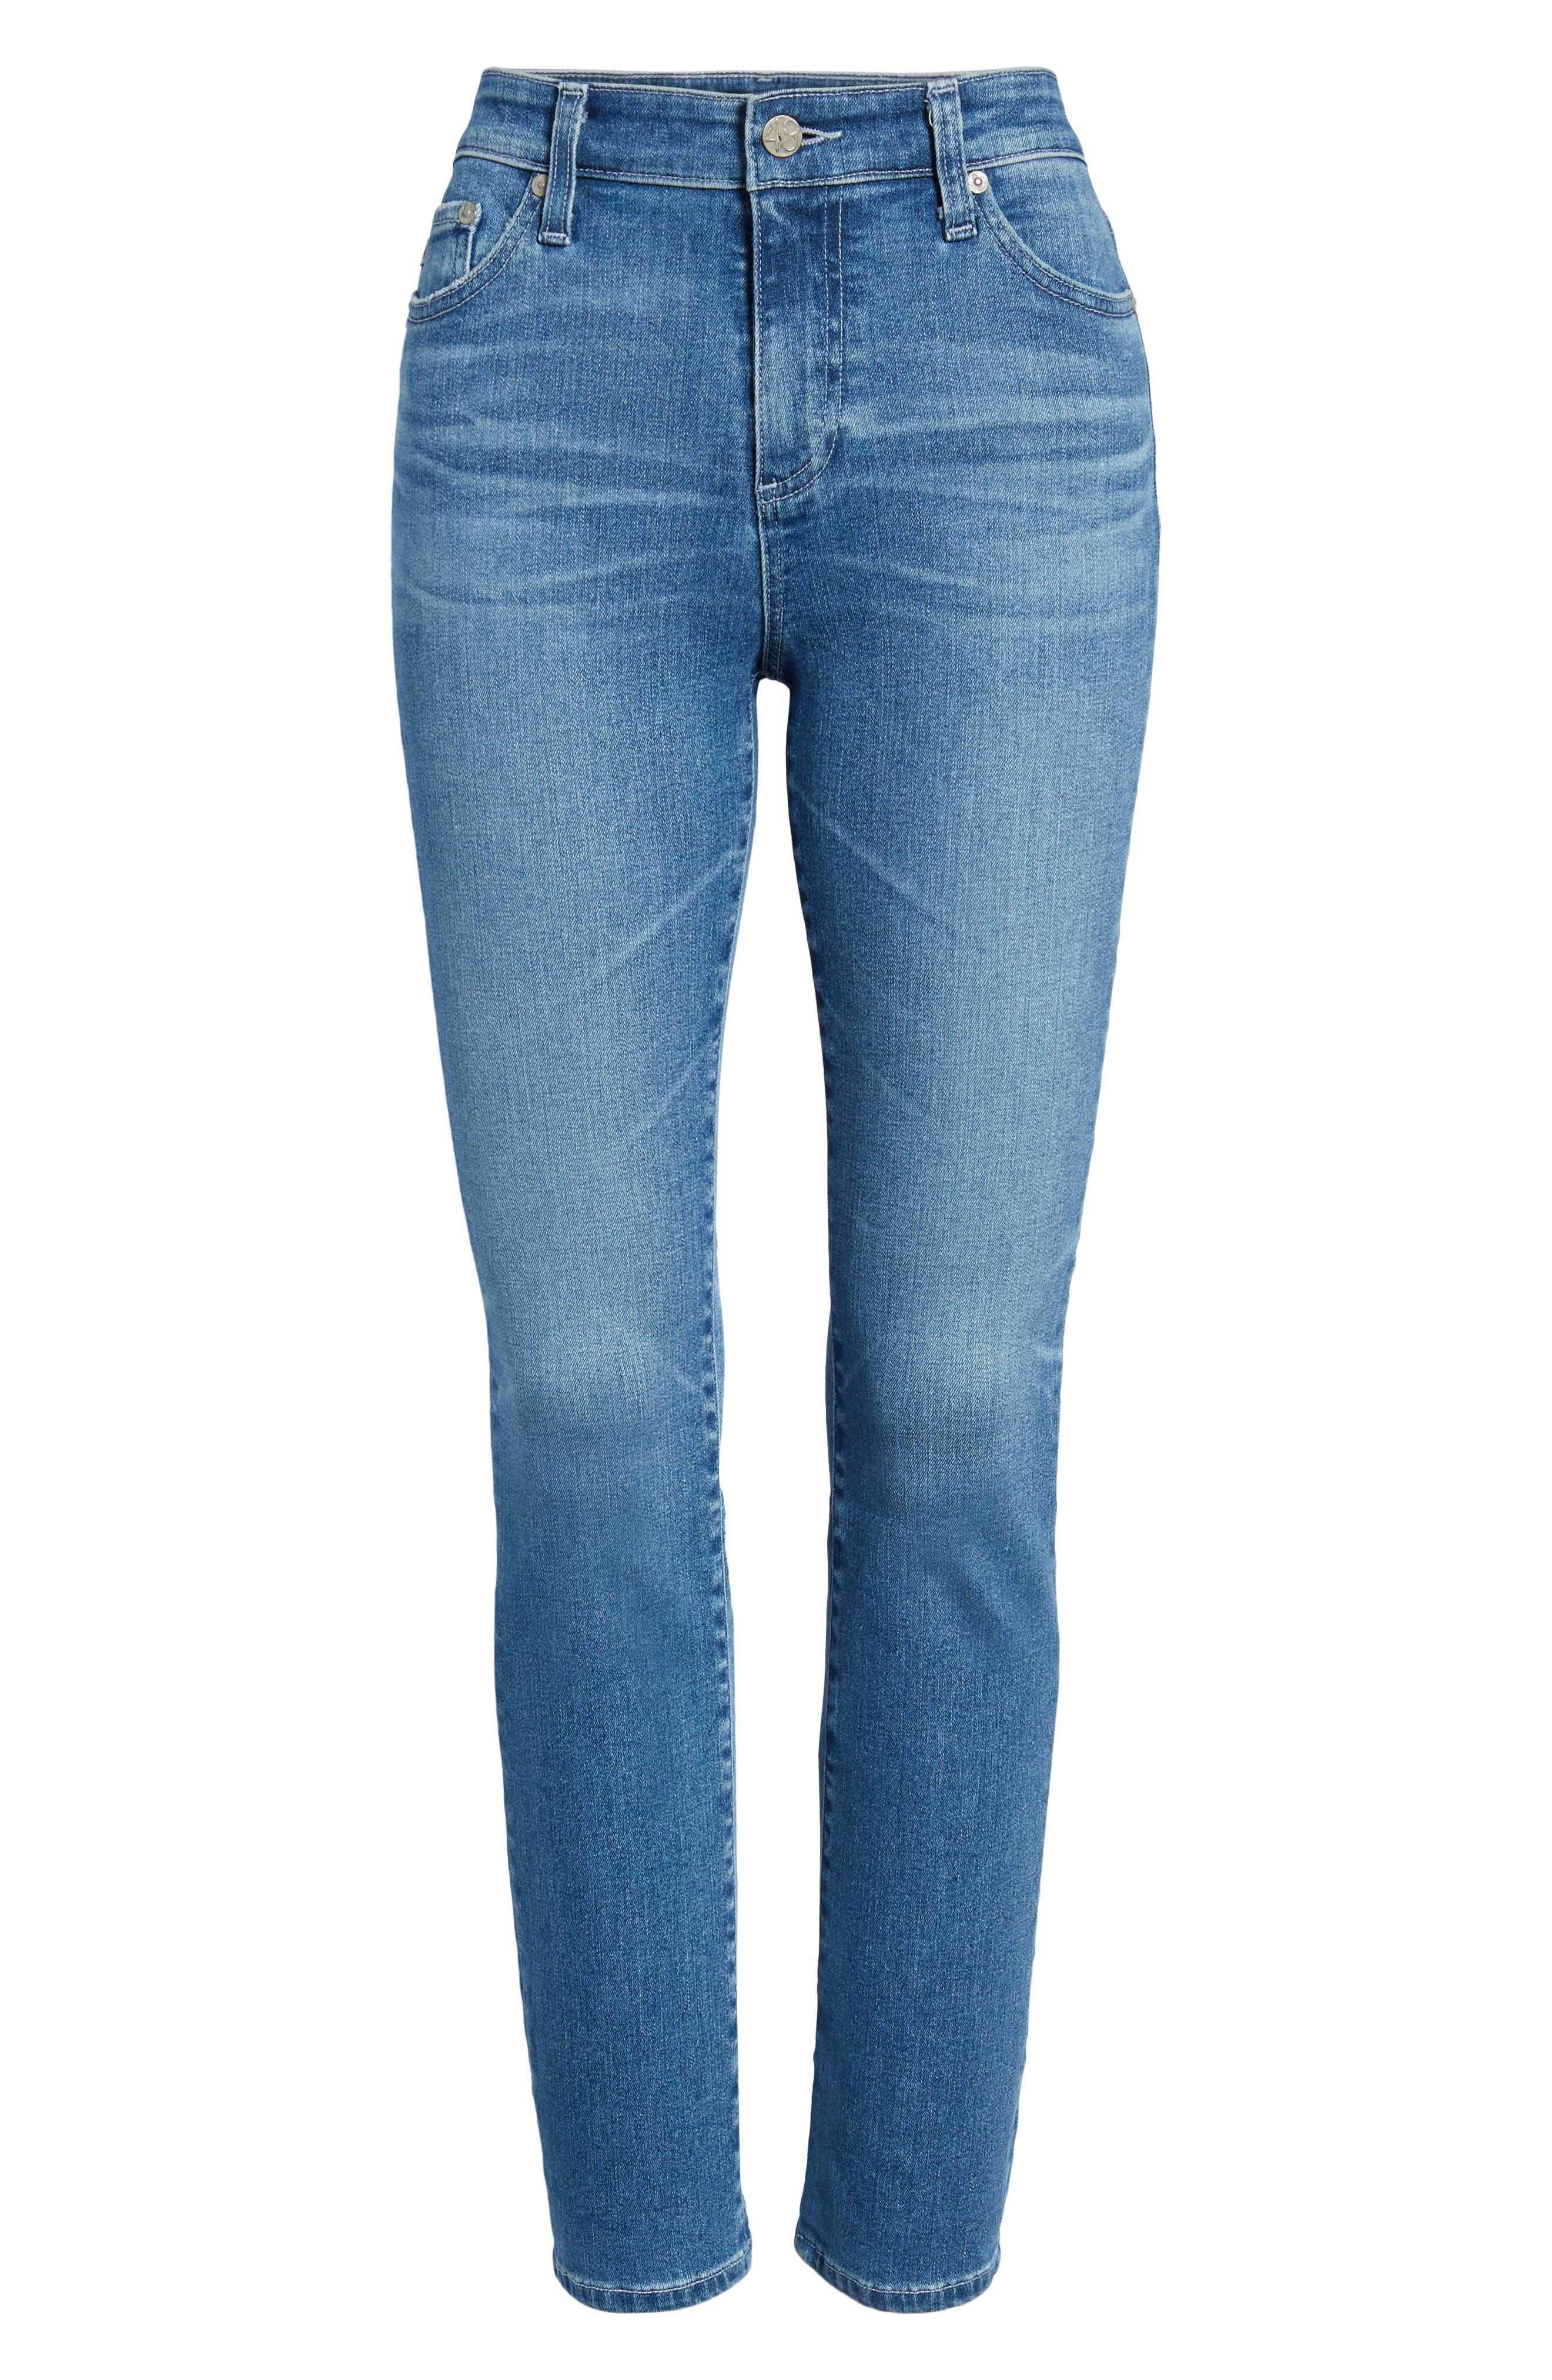 Mari High Waist Slim Straight Leg Jeans,                             Alternate thumbnail 7, color,                             16 YEARS SERENITY